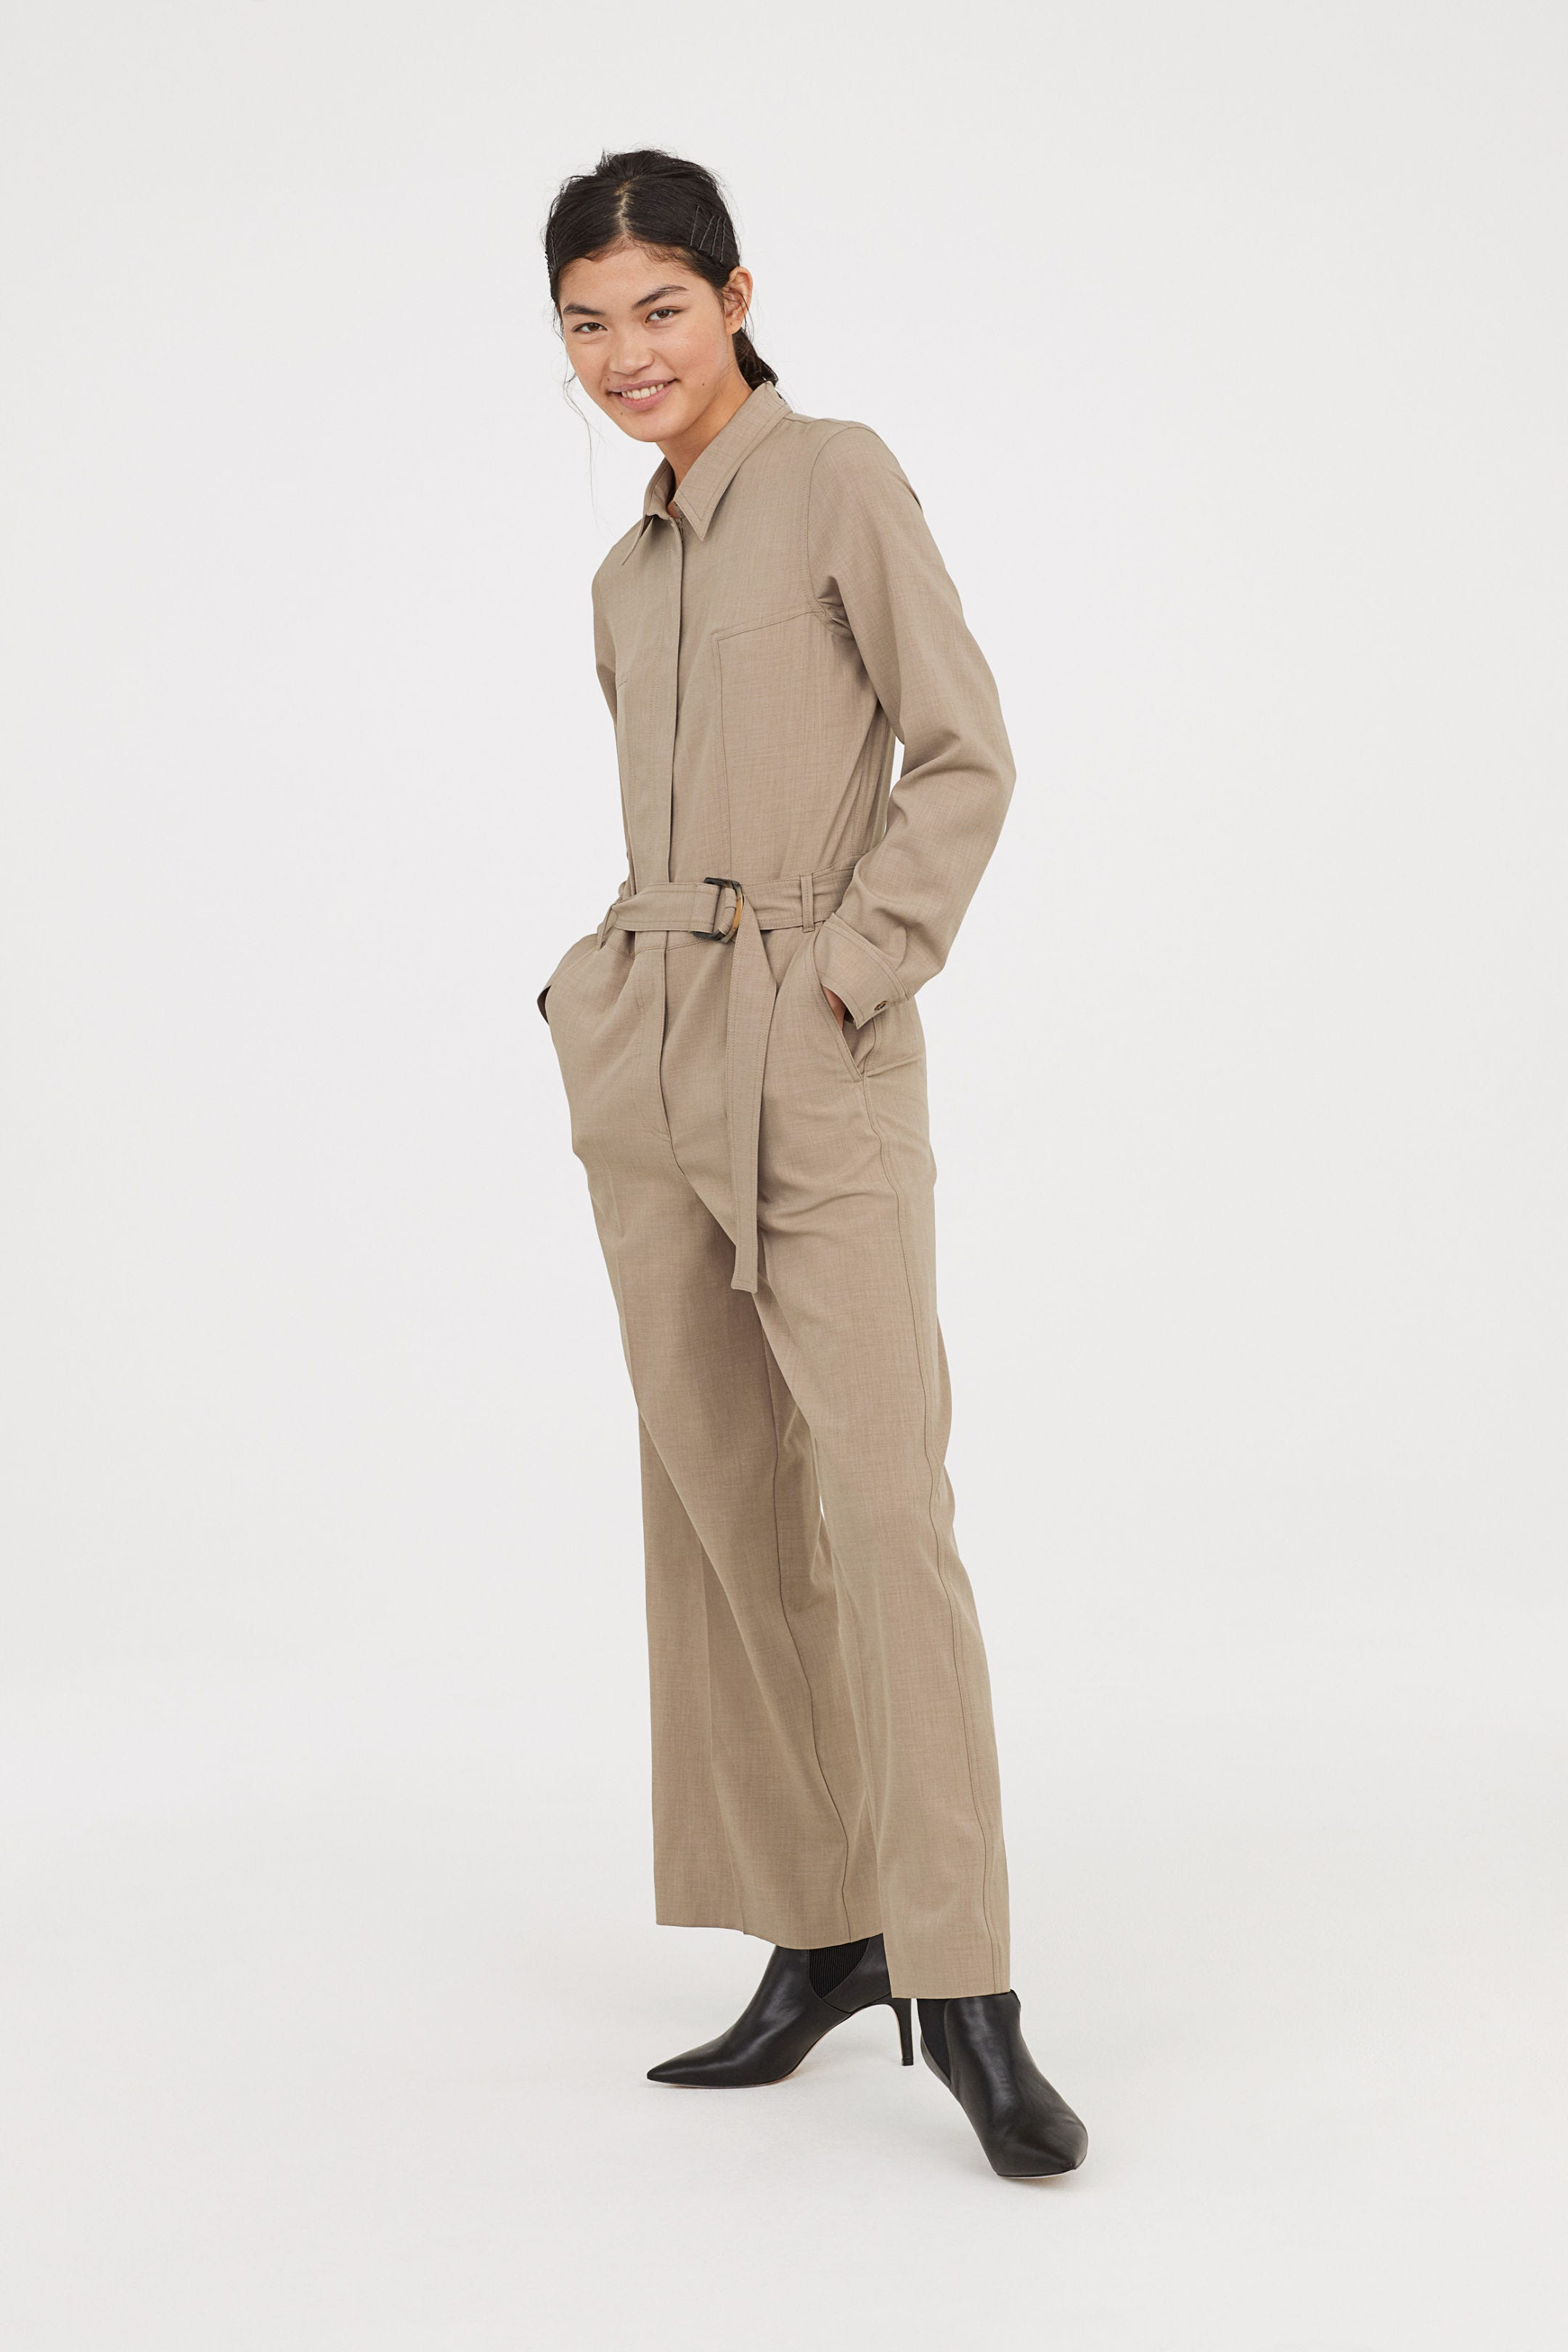 067053fd4804 Best Womens Boiler Suits